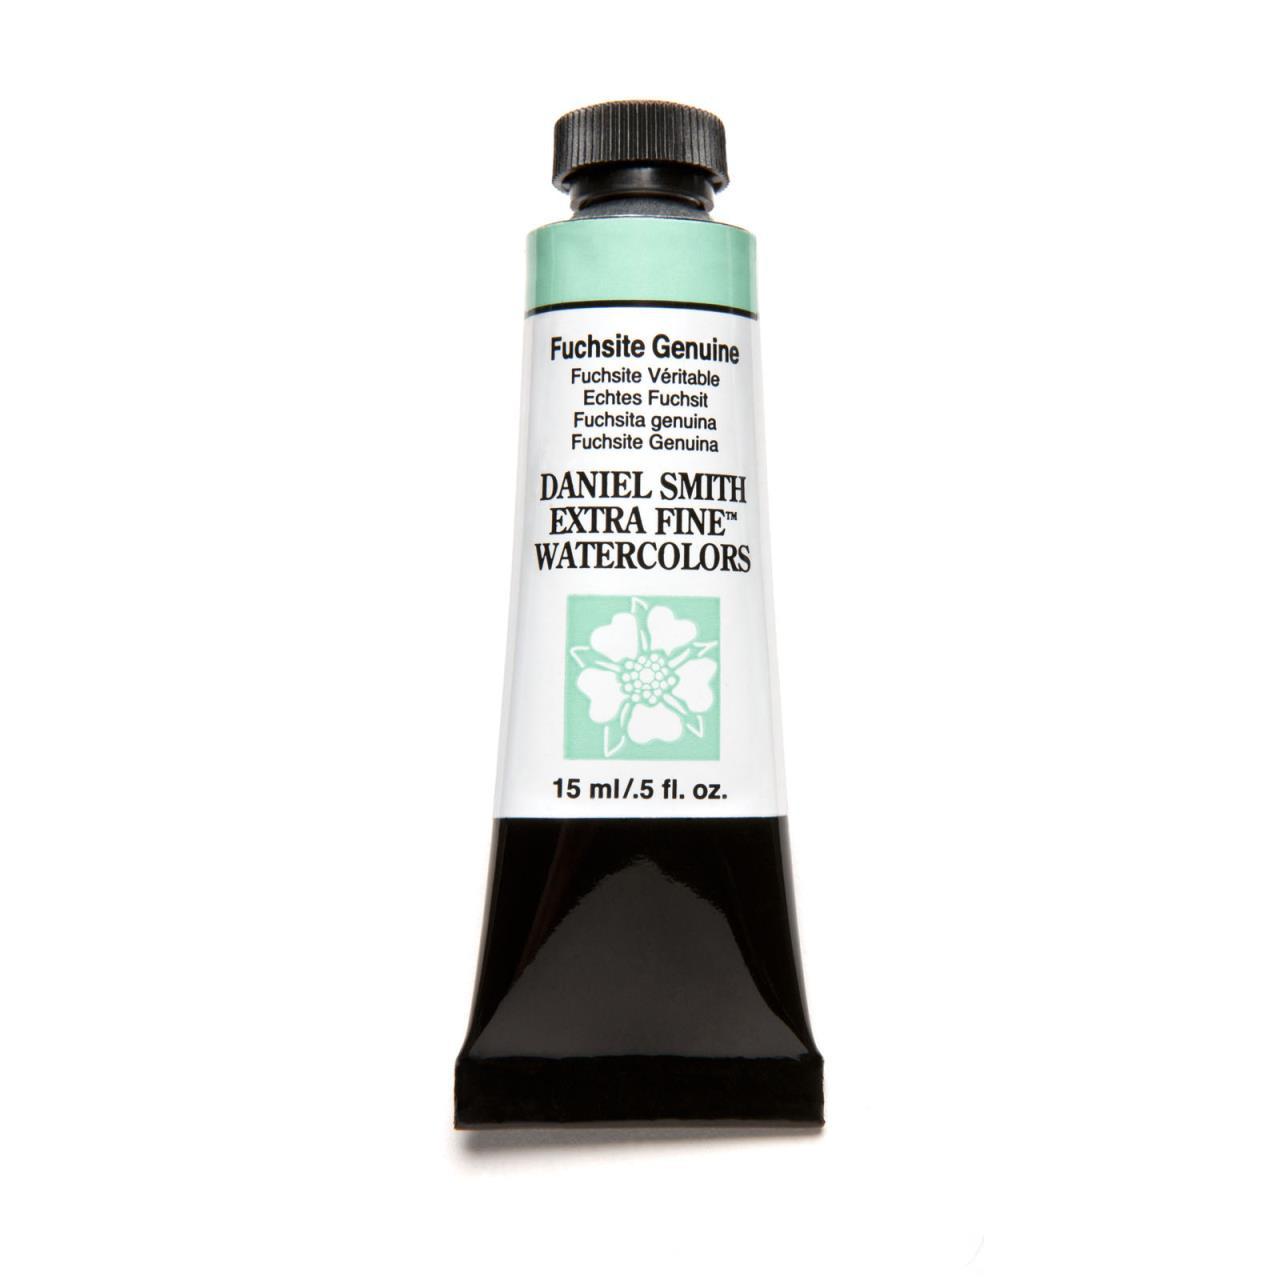 Fuchsite Genuine (PrimaTek), DANIEL SMITH Extra Fine Watercolors 15ml Tubes -